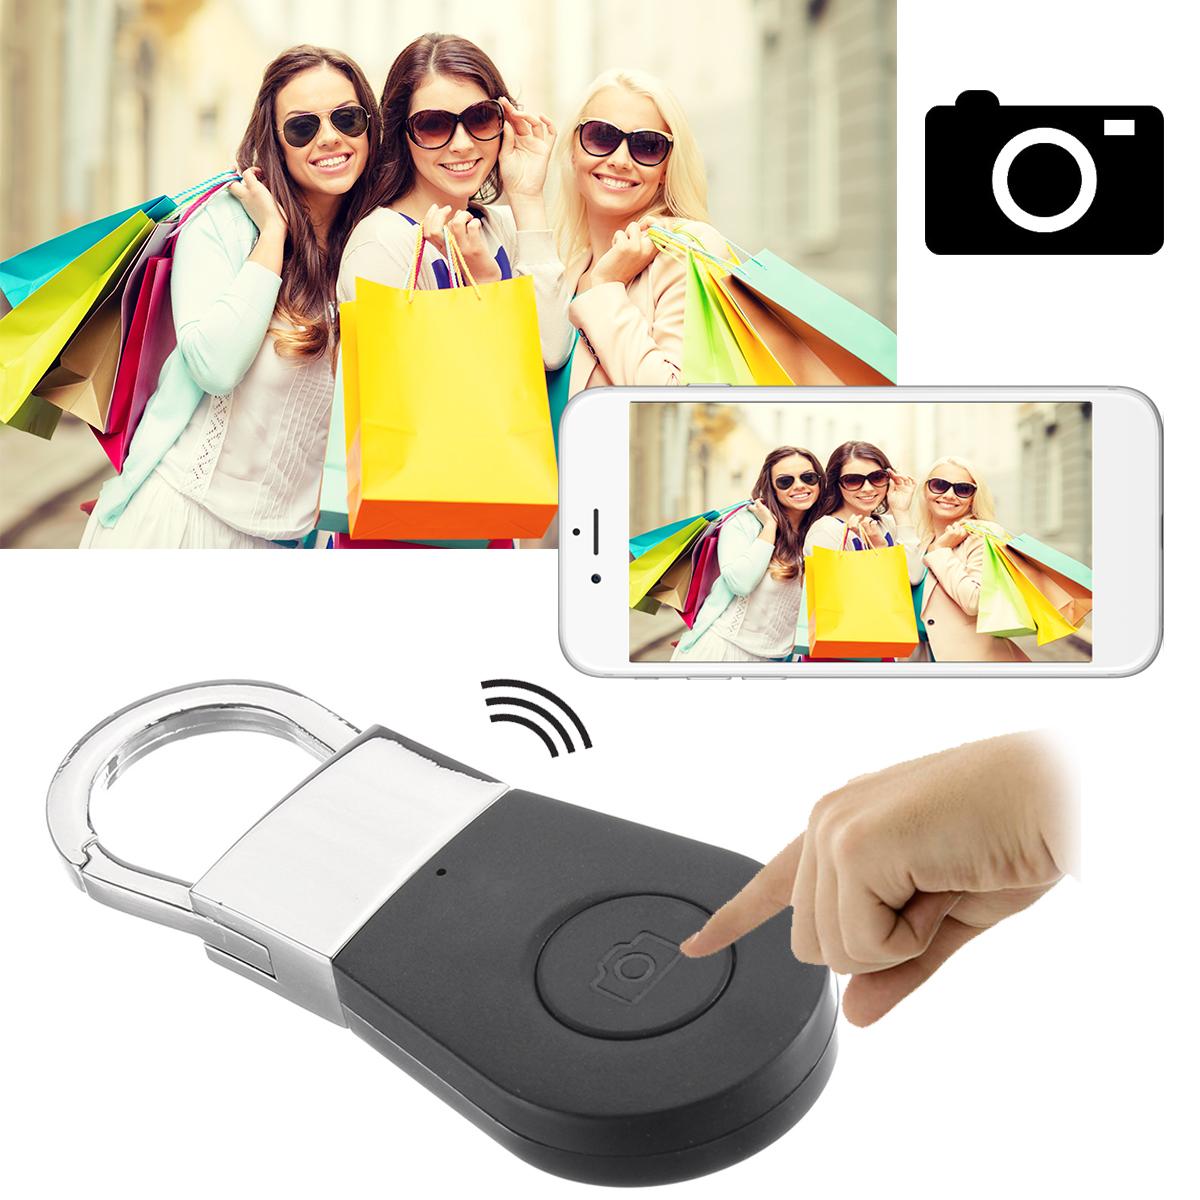 Bluetooth Keychain Tracker Finder Locator Anti Lost GPS Alarm Child Pet Tracking